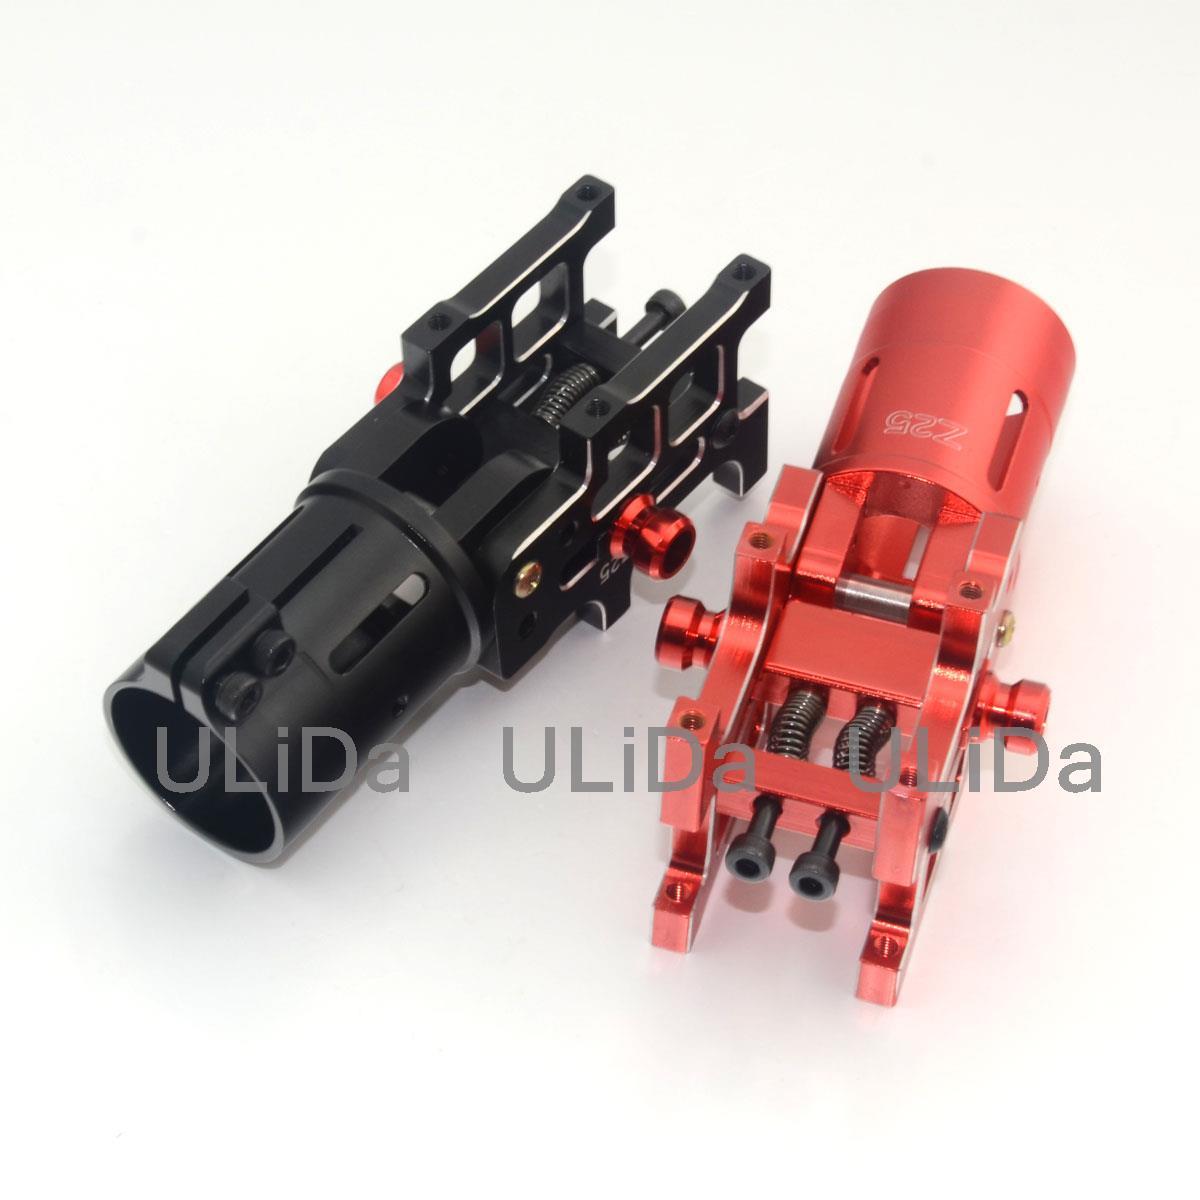 Nuevo V4 actualizado CNC aluminio plegable brazo tubo Z25 doble tornillo de bloqueo automático para diámetro 25mm Tubo RC Quadcopter Multirotor Drone